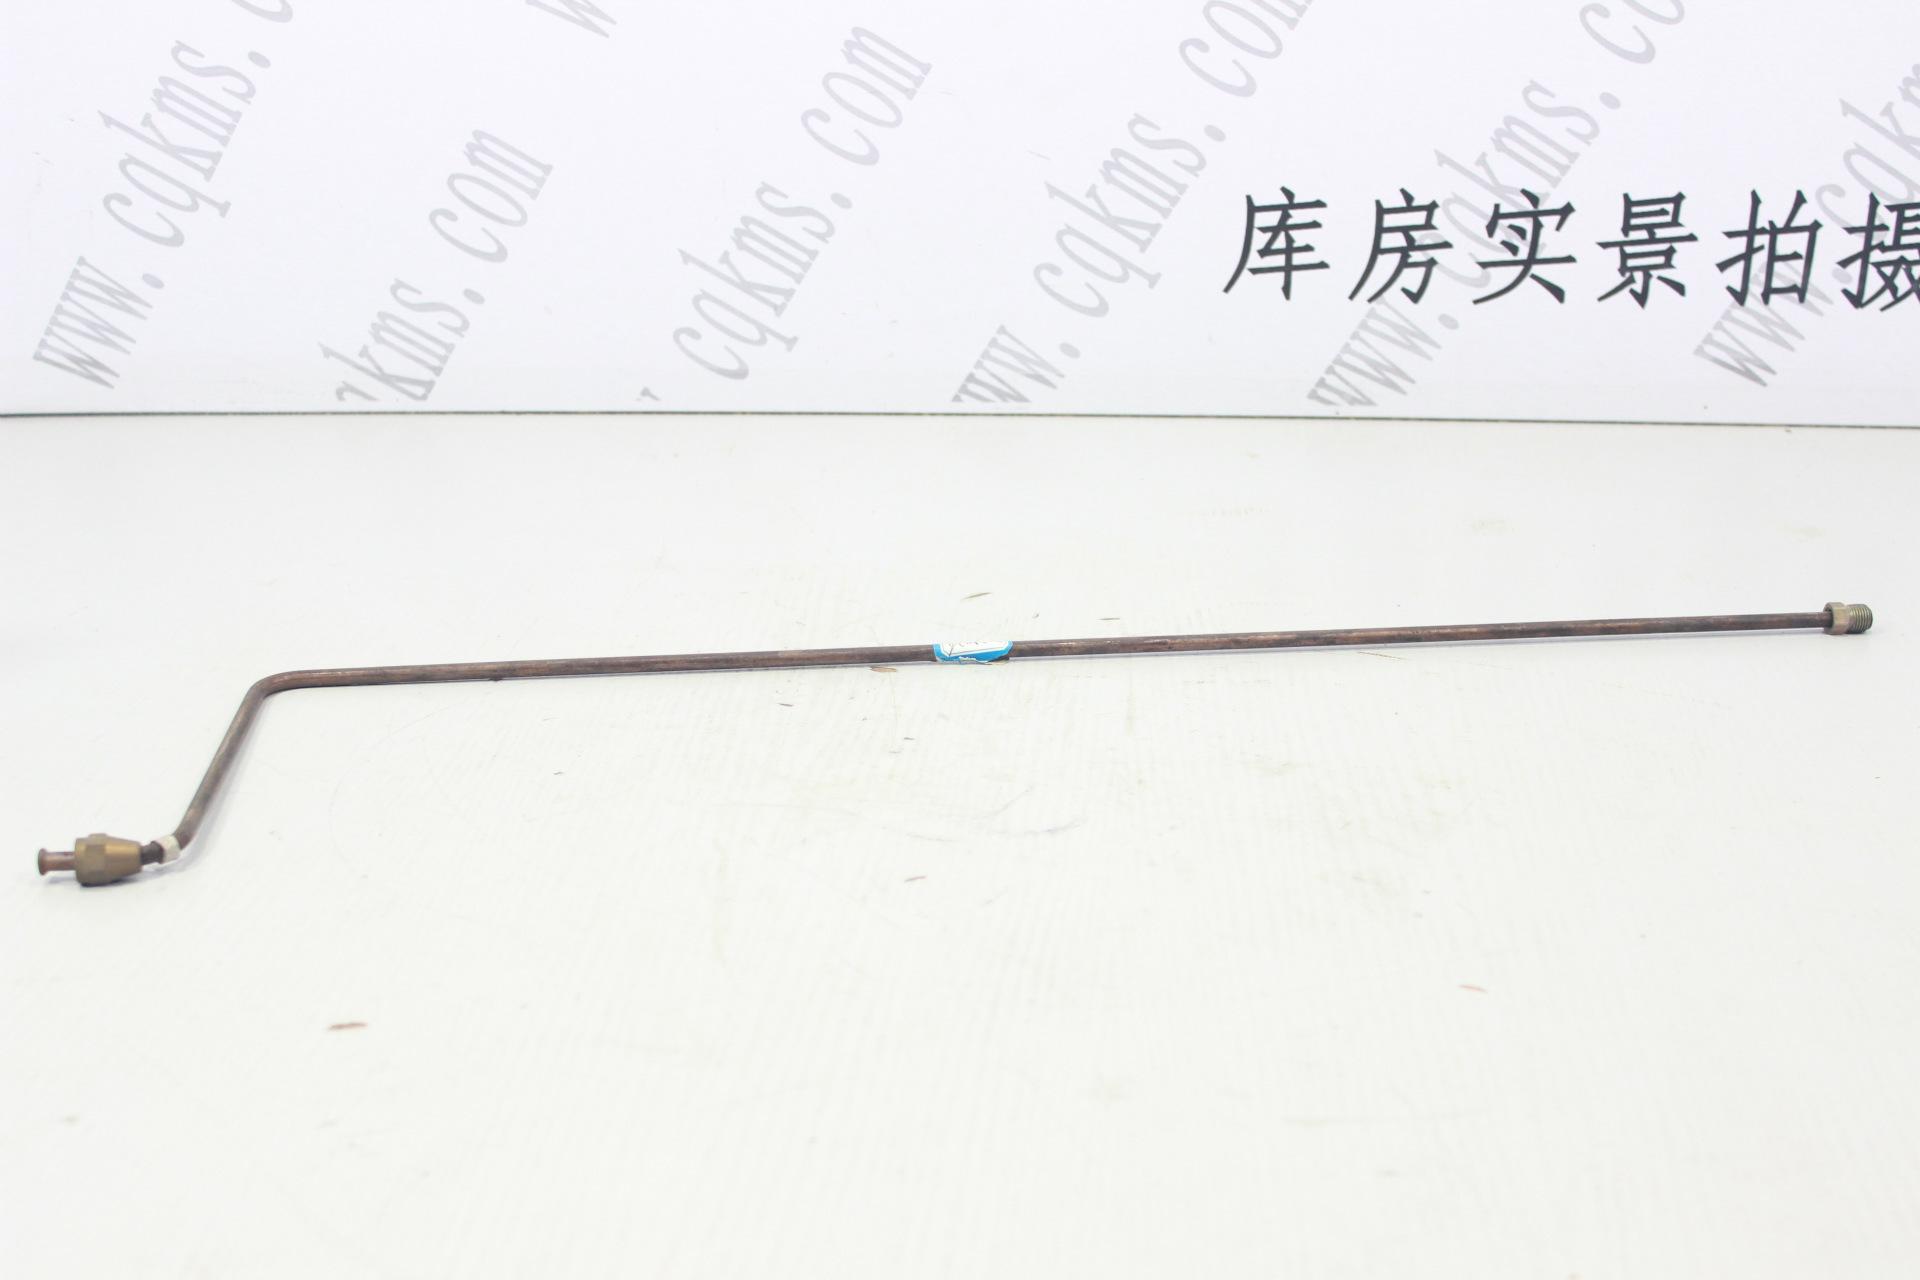 kms05097-3038026-油管---参考规格外径0.8cm,内径0.5cm-参考重量0.1Kg-0.1Kg图片2